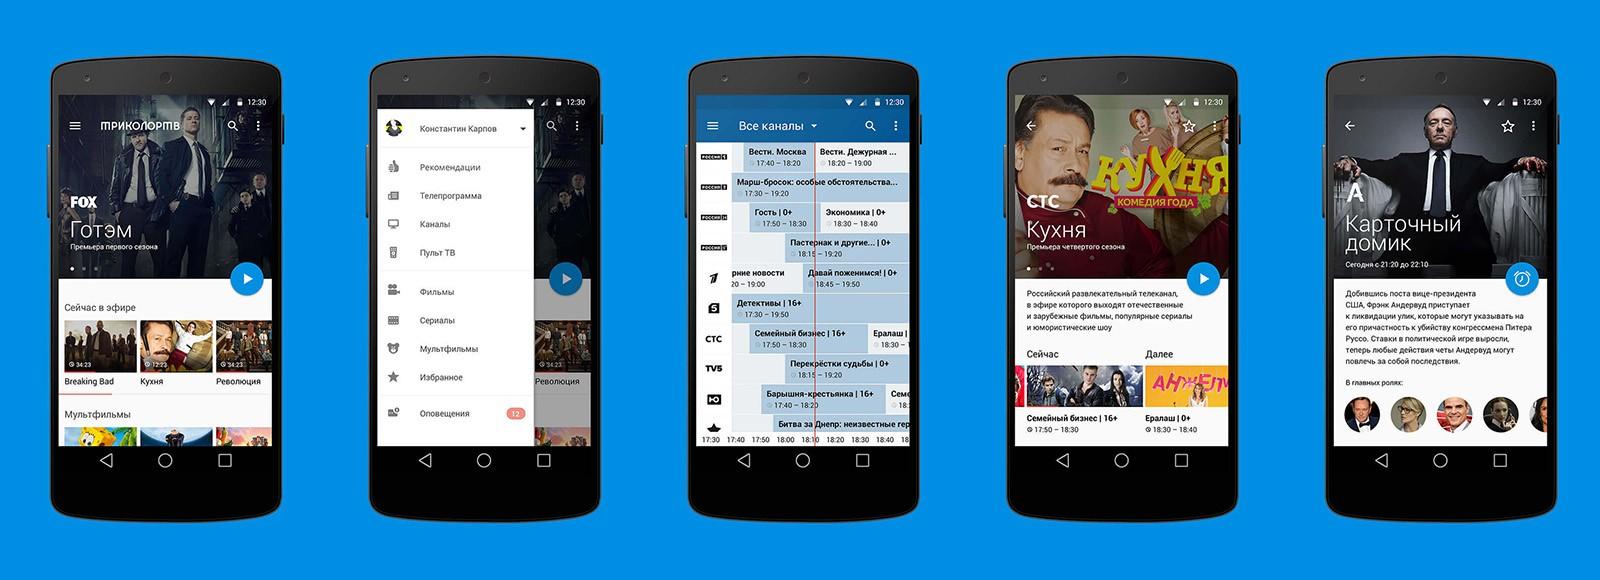 app-screenshots-sample